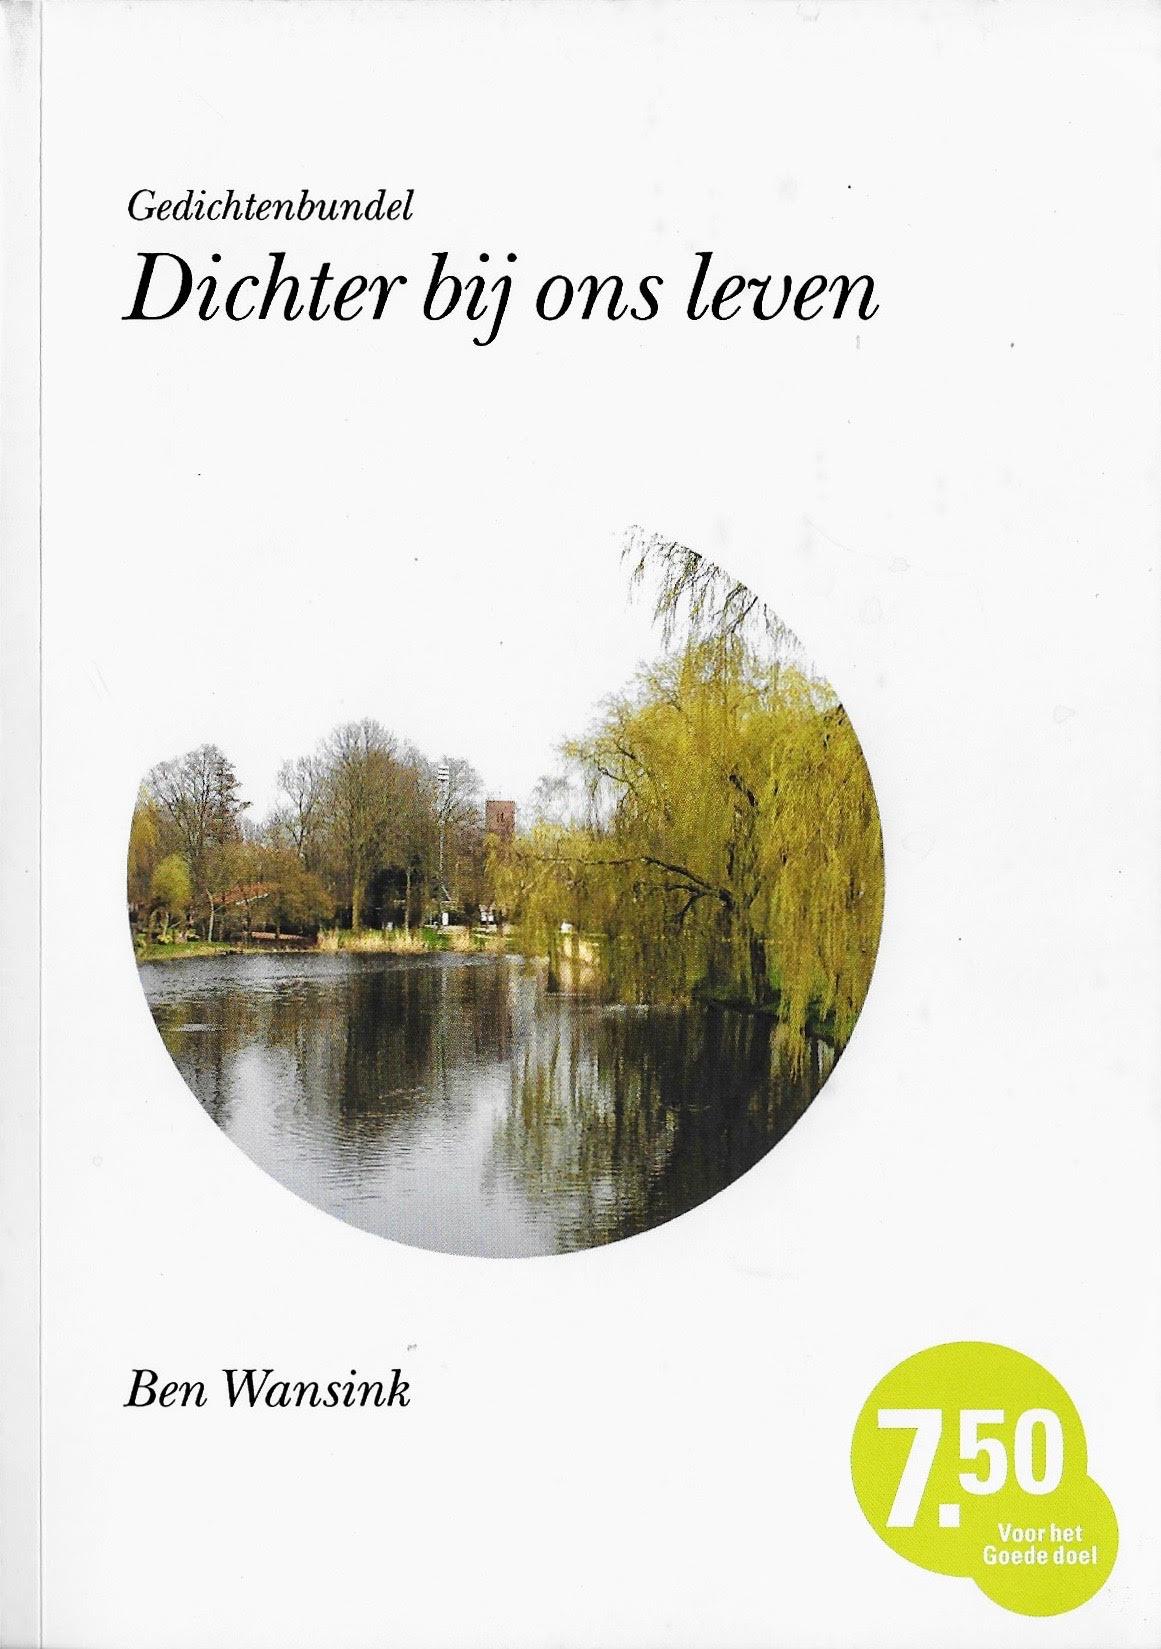 V.l.n.r. Iet van de Berg (seniorencoach Wonen Plus Welzijn), Guido Lamm (zanger), Ben Wansink (auteur) en Marieke Neesen (St. Lief Langedijk). (Foto: Vincent de Vries/RM)  rodi.nl © rodi